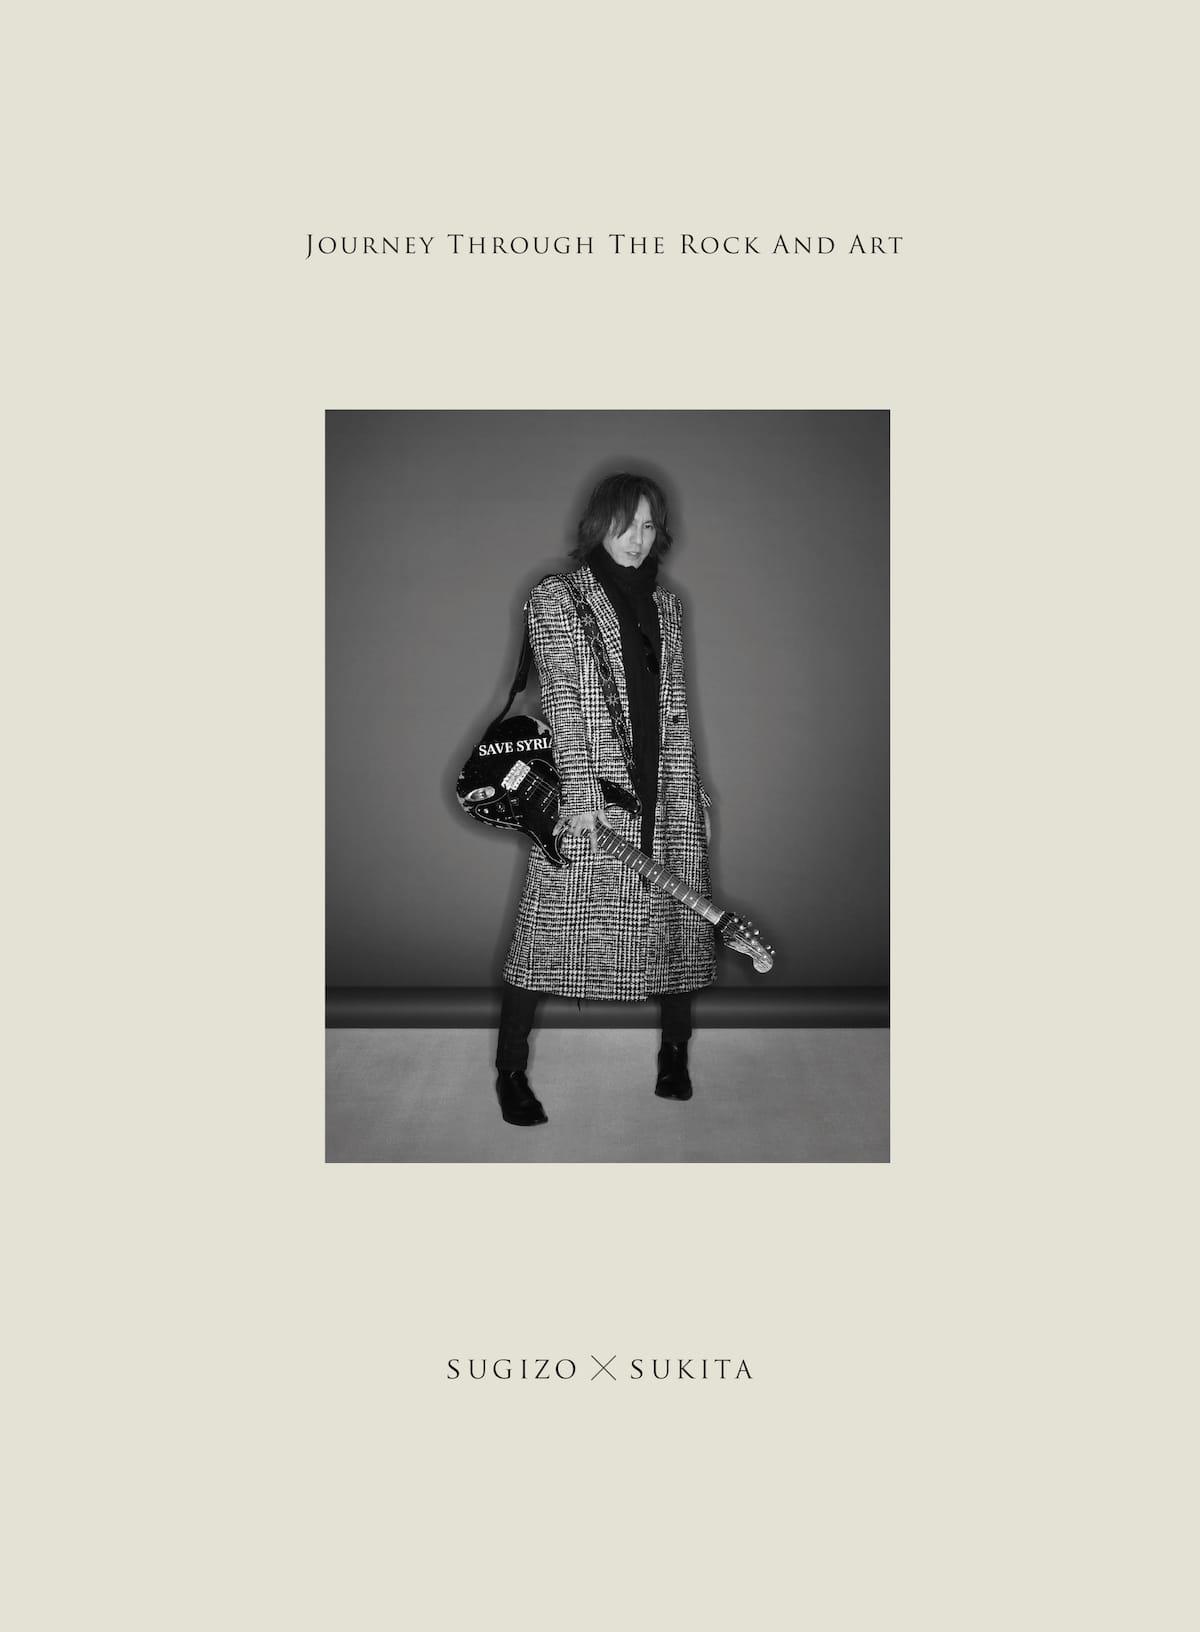 SUGIZOを写真家・鋤田正義が撮り下ろした写真集が発売決定&記念展覧会が渋谷 GALLERY X BY PARCOにて開催! art_culture180418_journey-throught-the-rock-and-art-sugizo-x-sukita-4-1200x1632